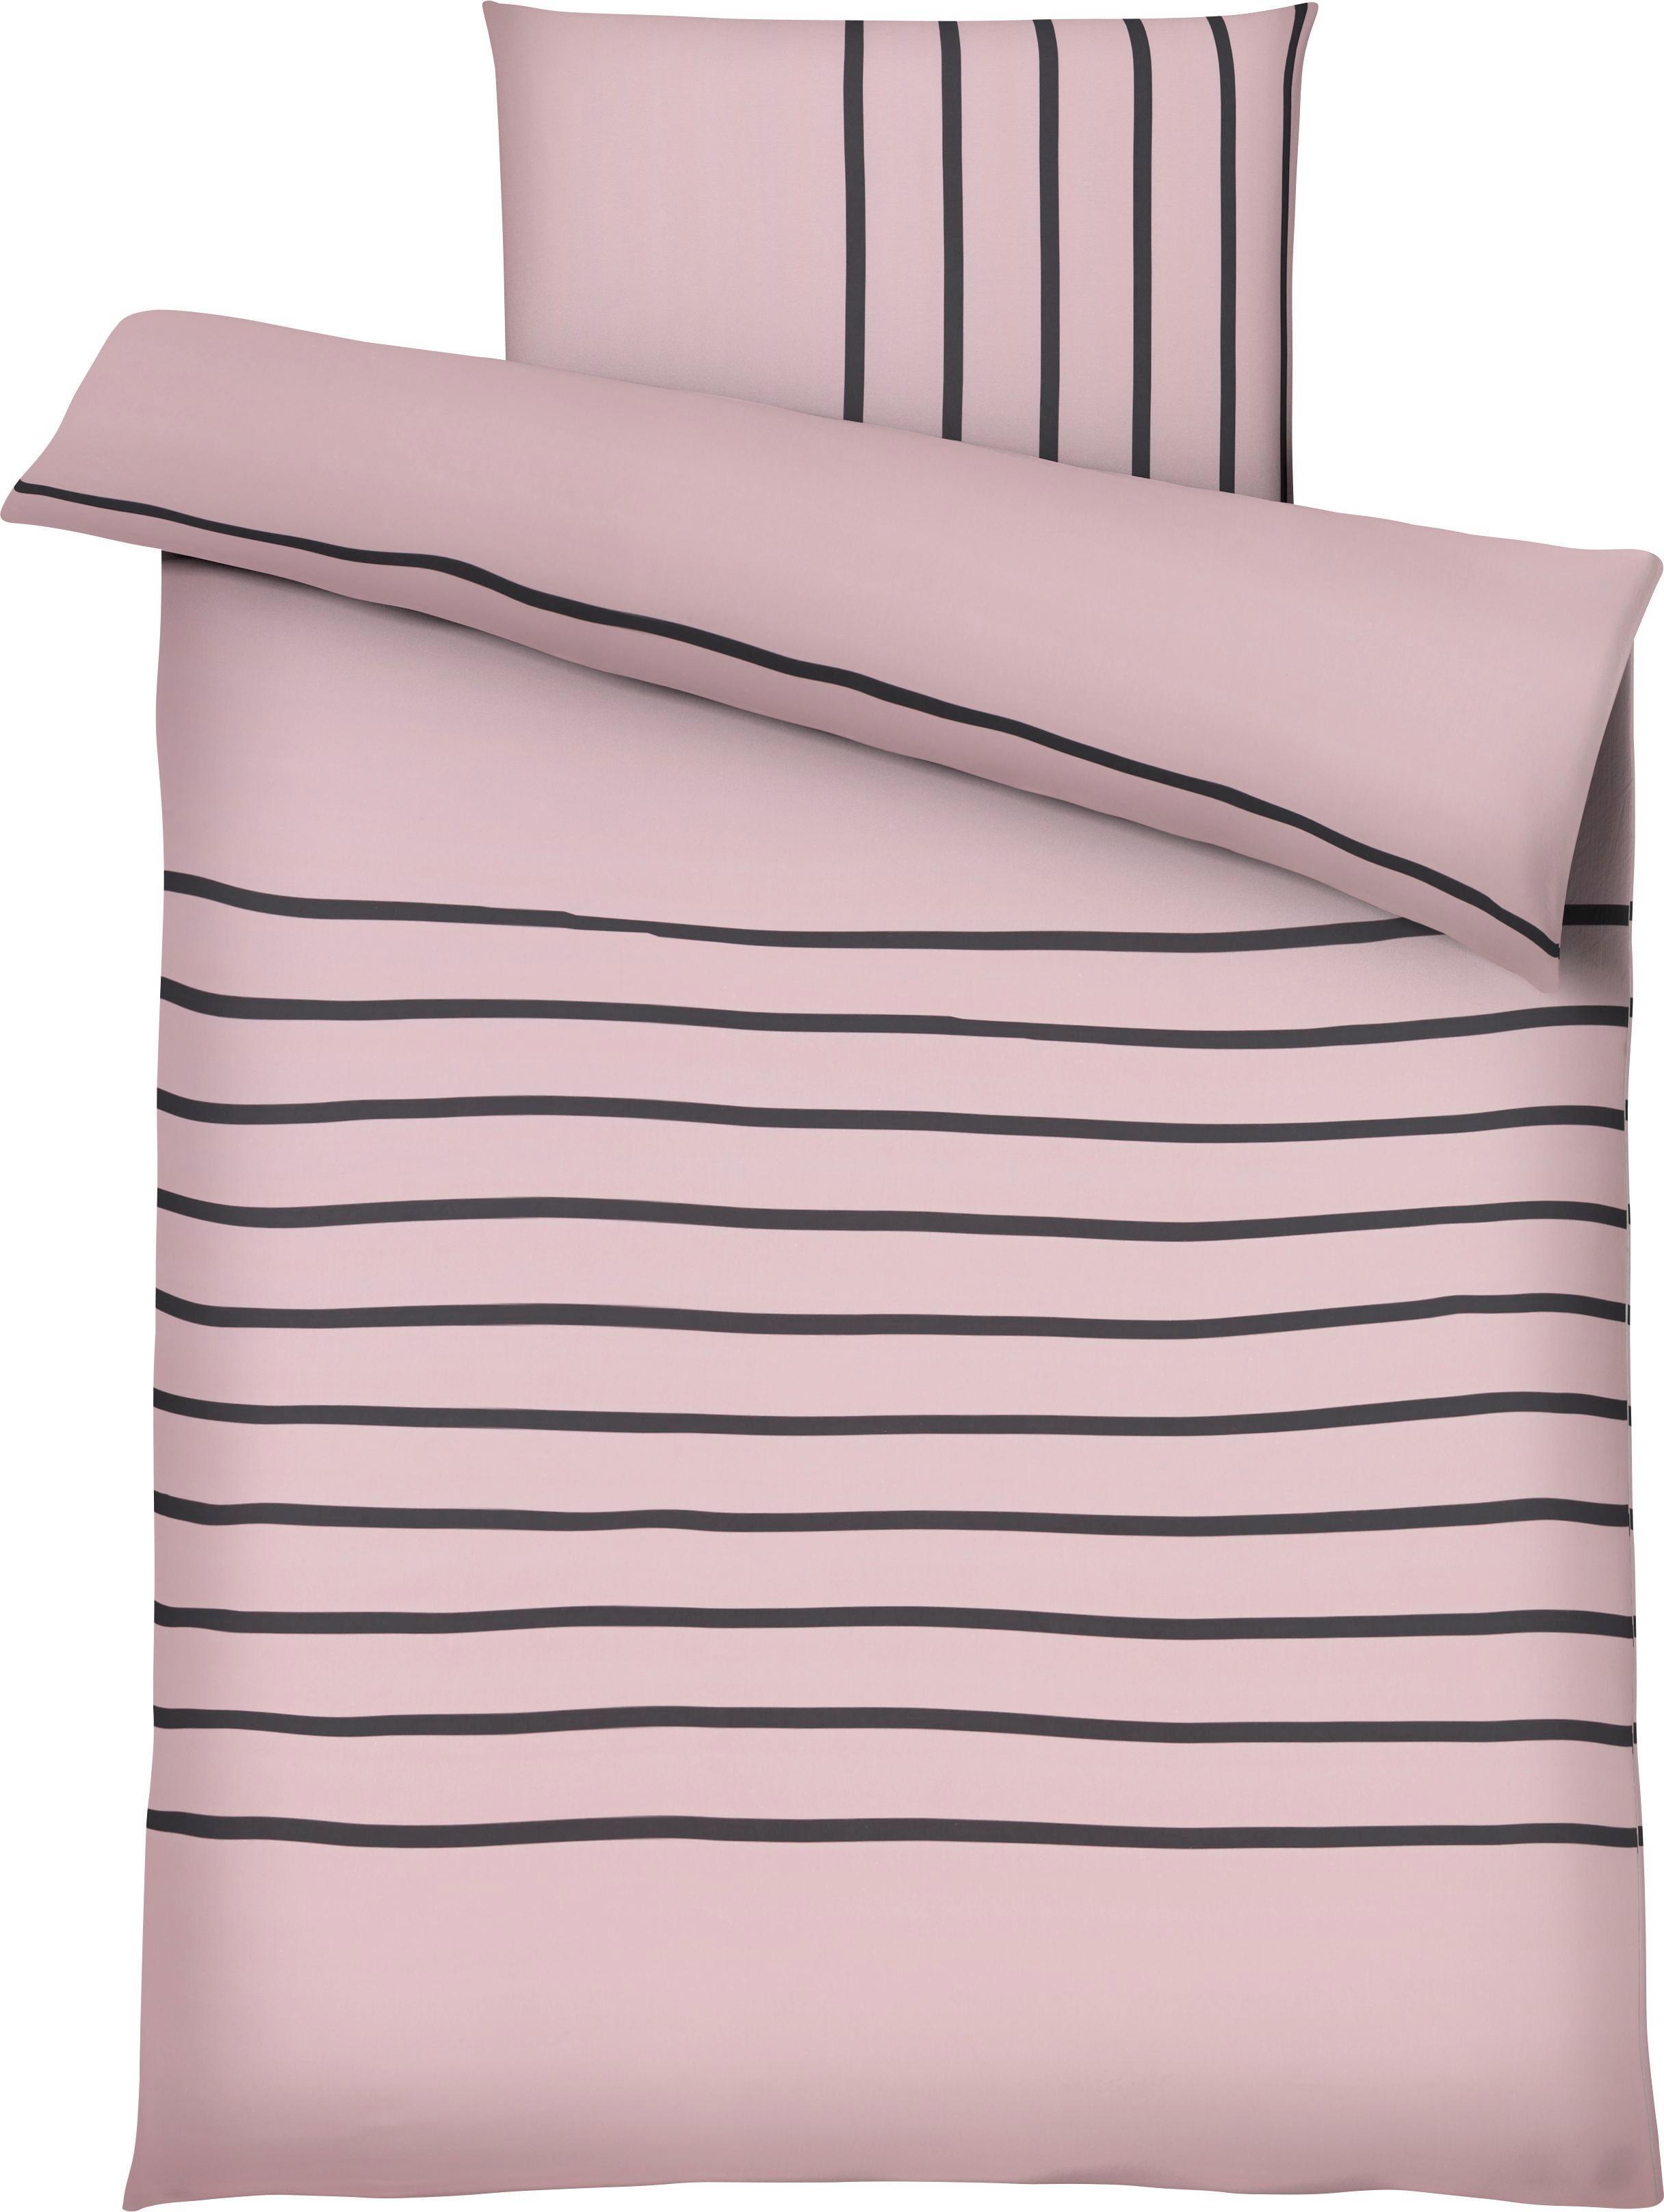 Bettwäsche Tamara in Rosa, ca. 135x200cm - Rosa, MODERN, Textil (135/200cm) - MÖMAX modern living